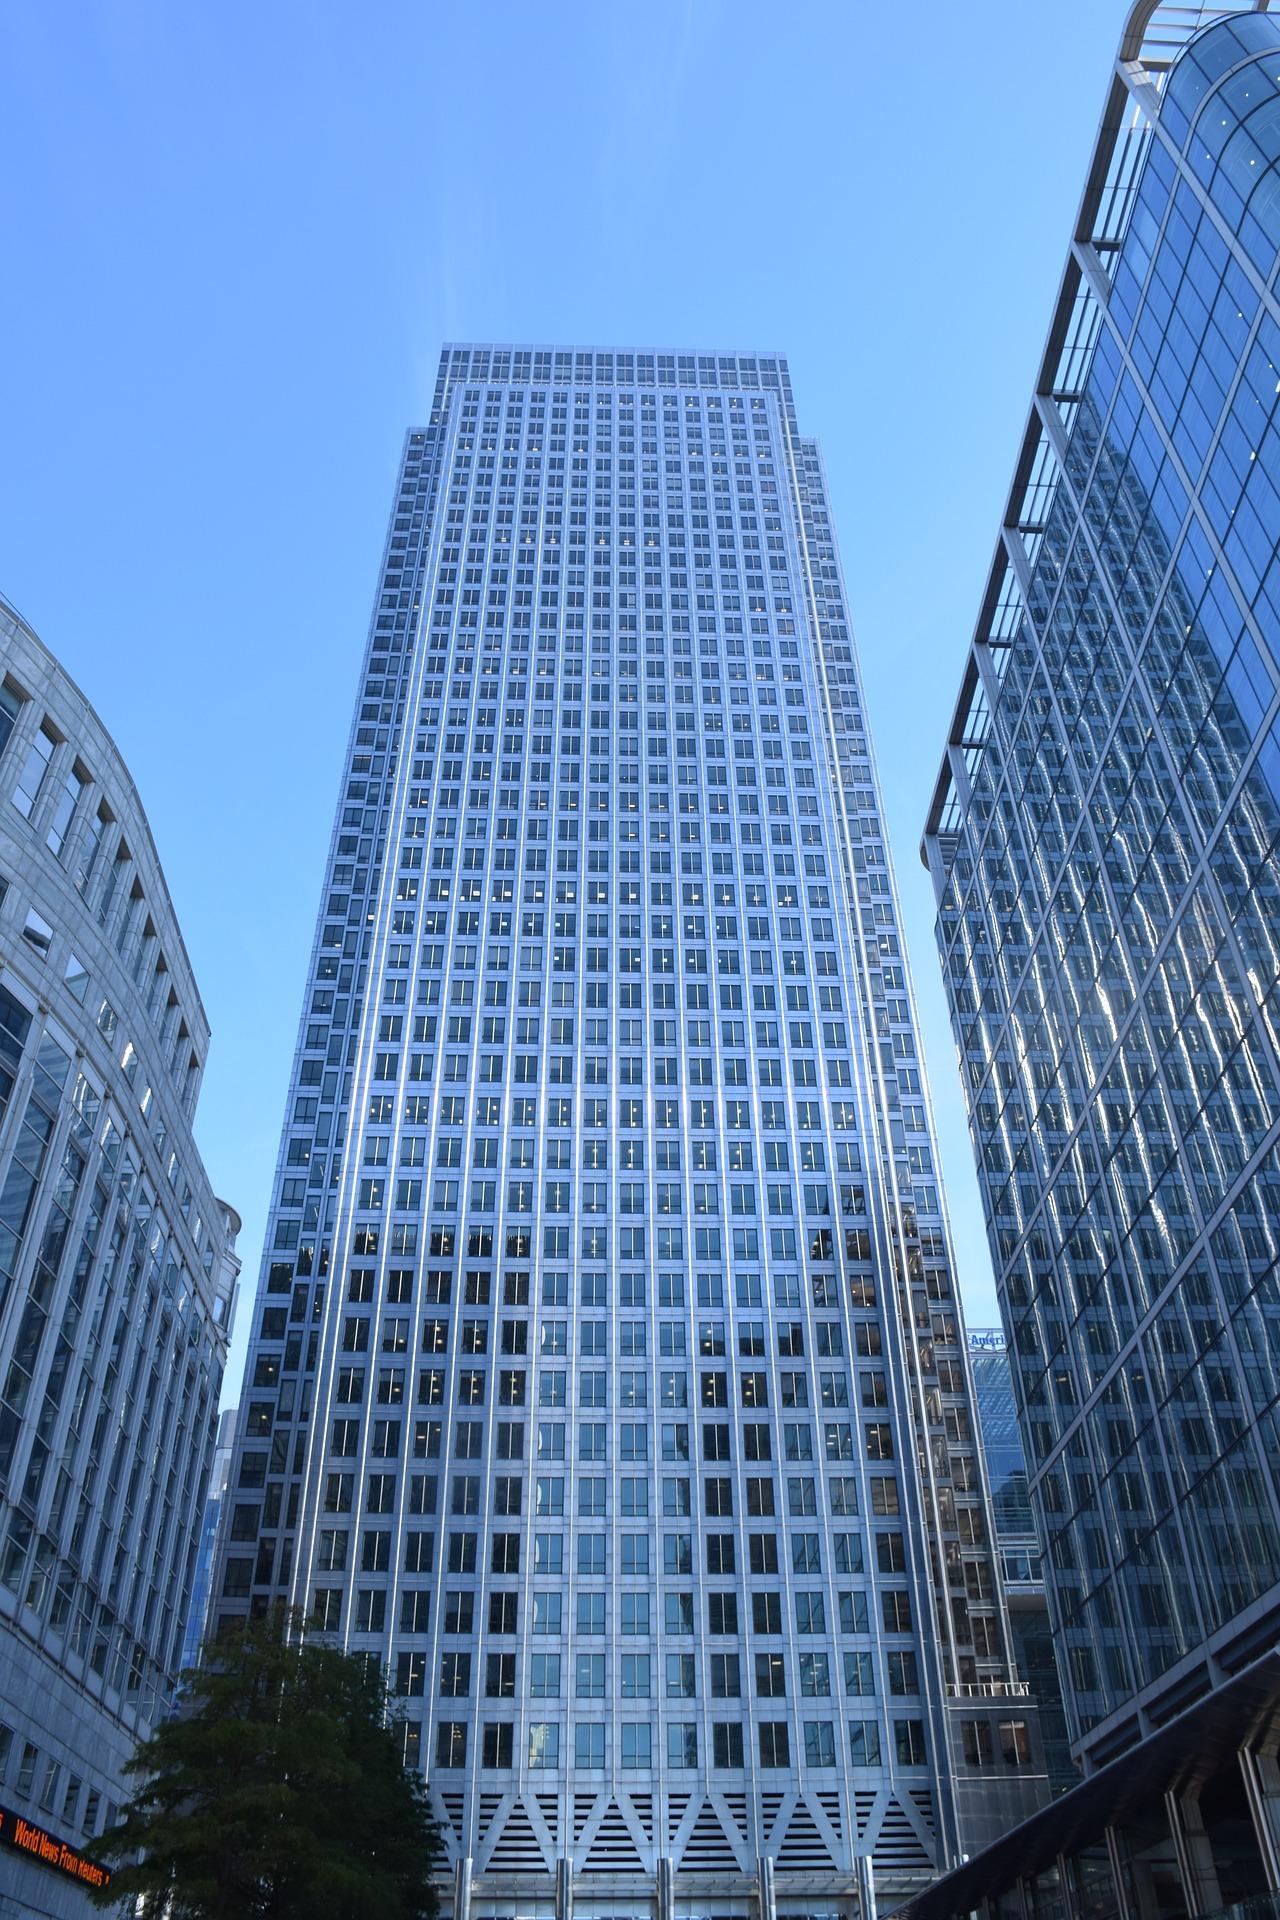 SCB skyscraper-3855012_1920.jpg